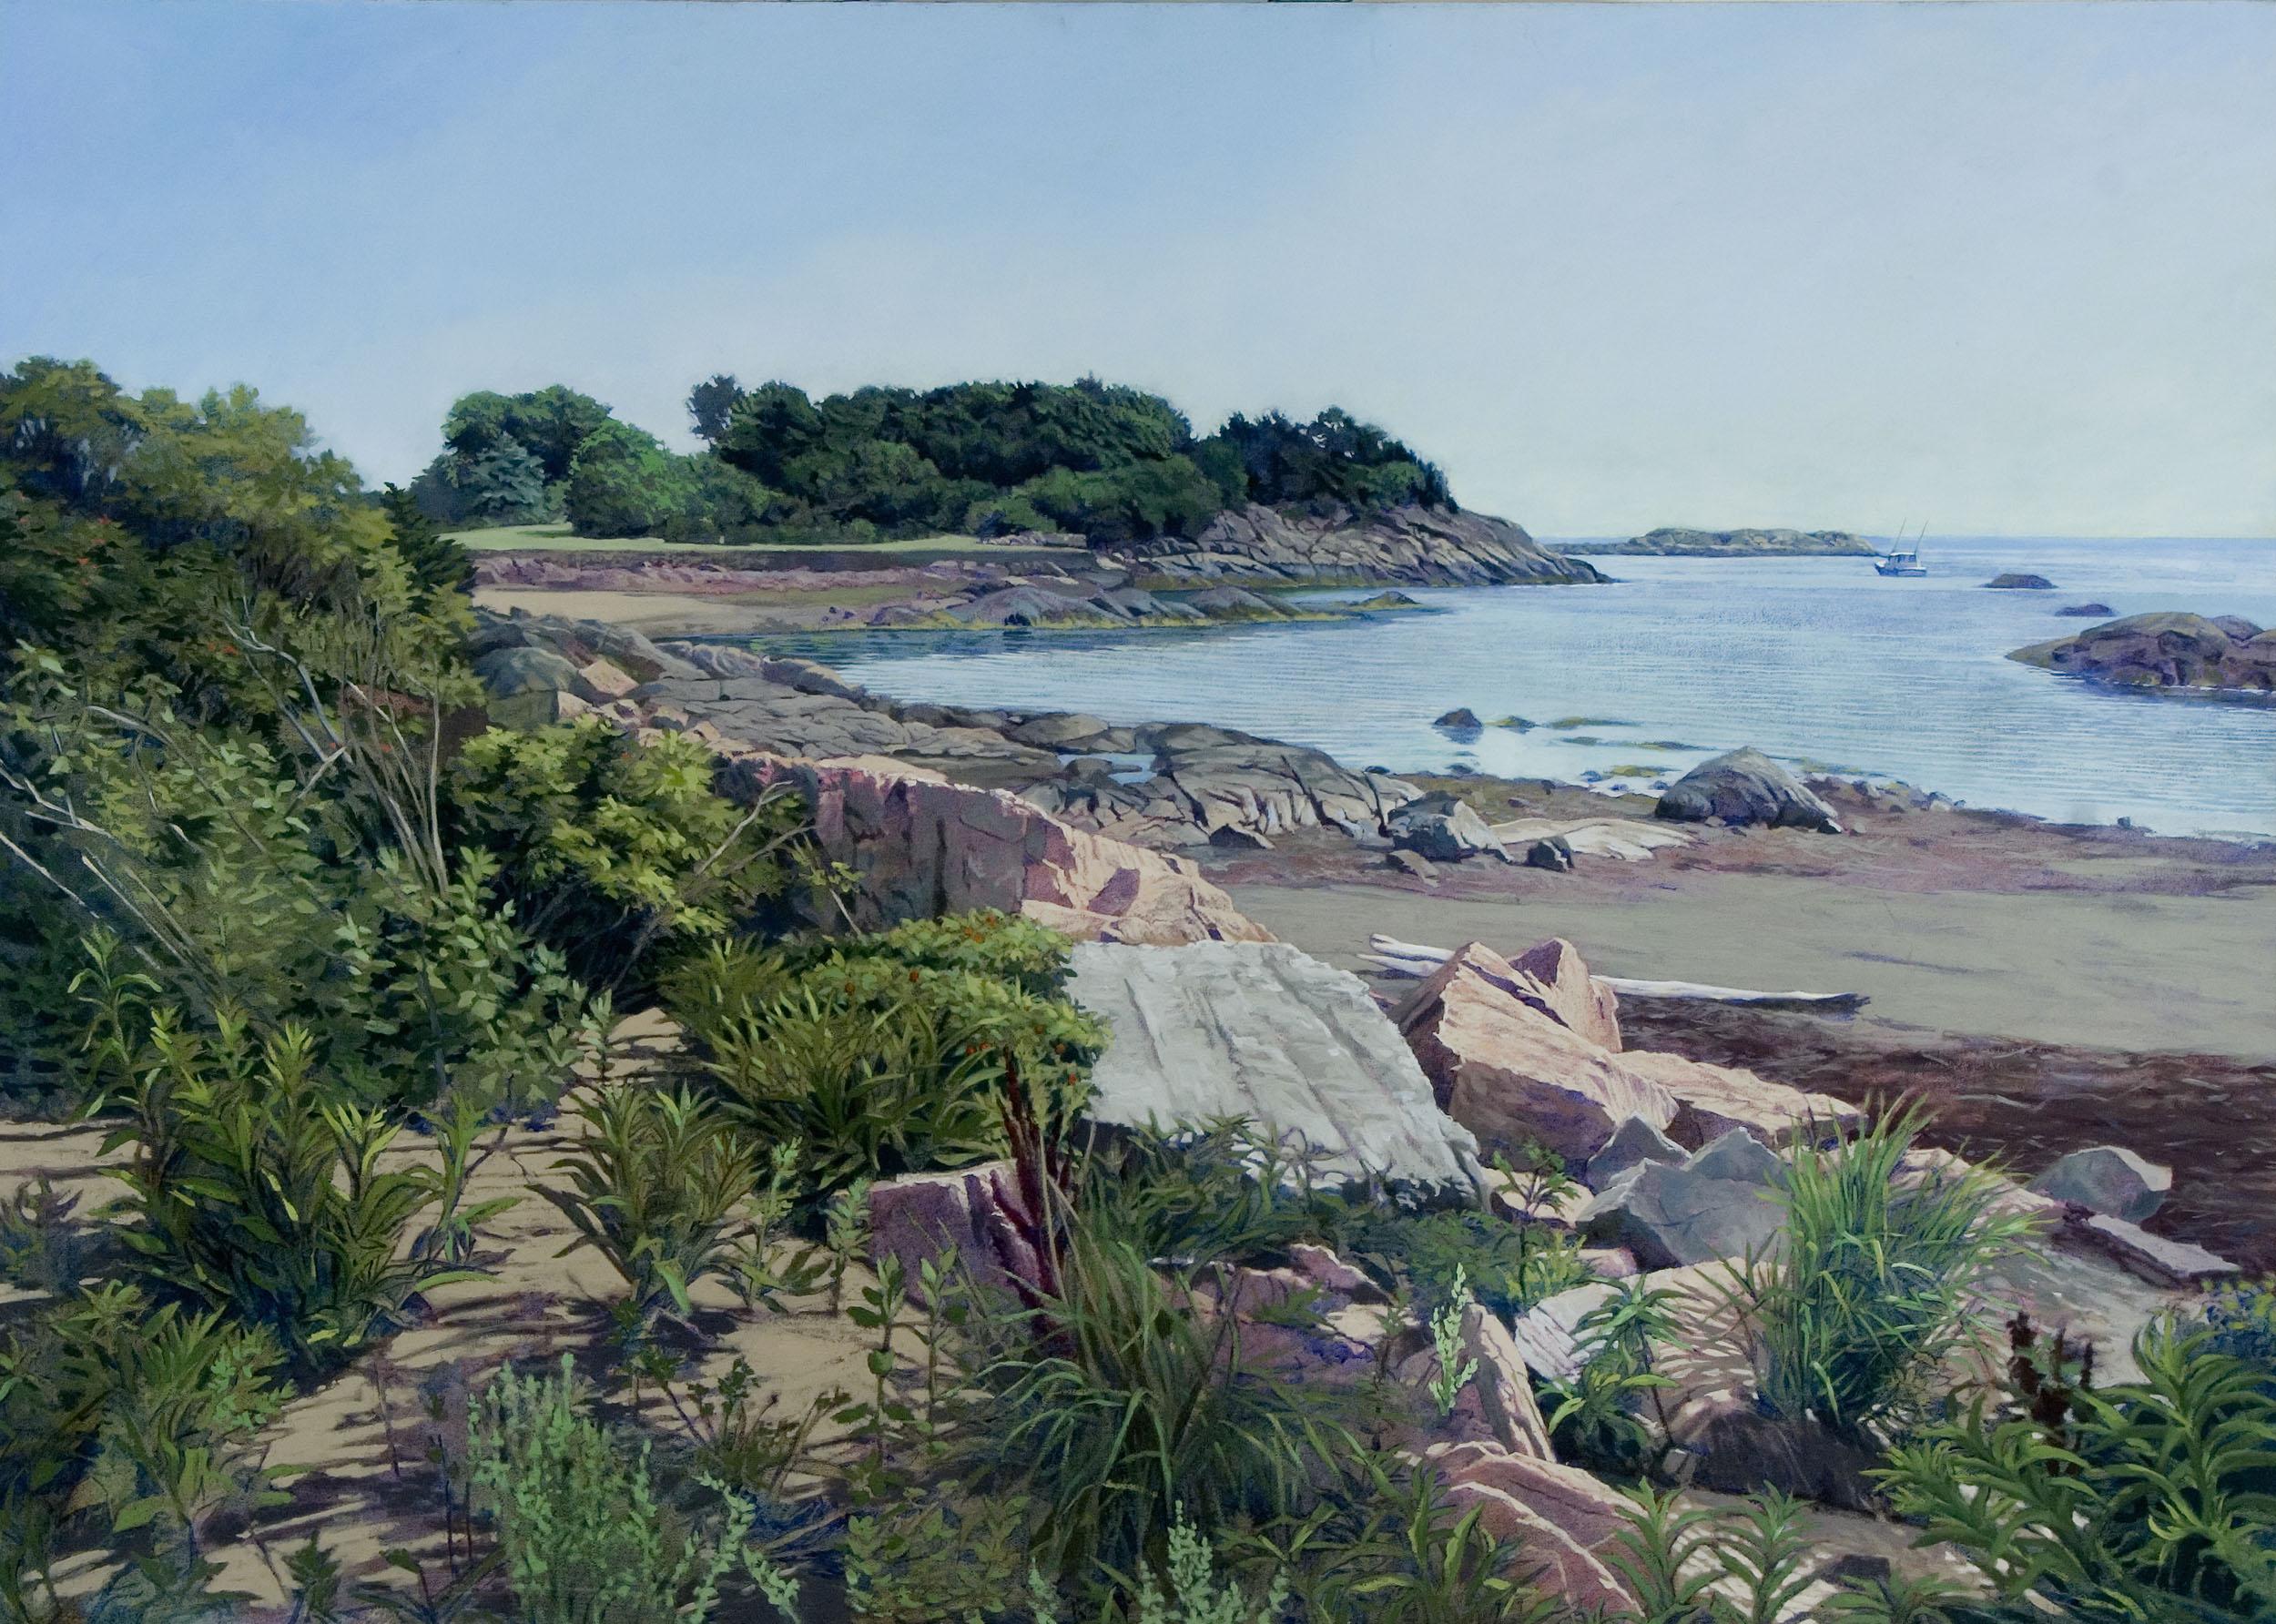 The Cove (Newport, Rhode Island)